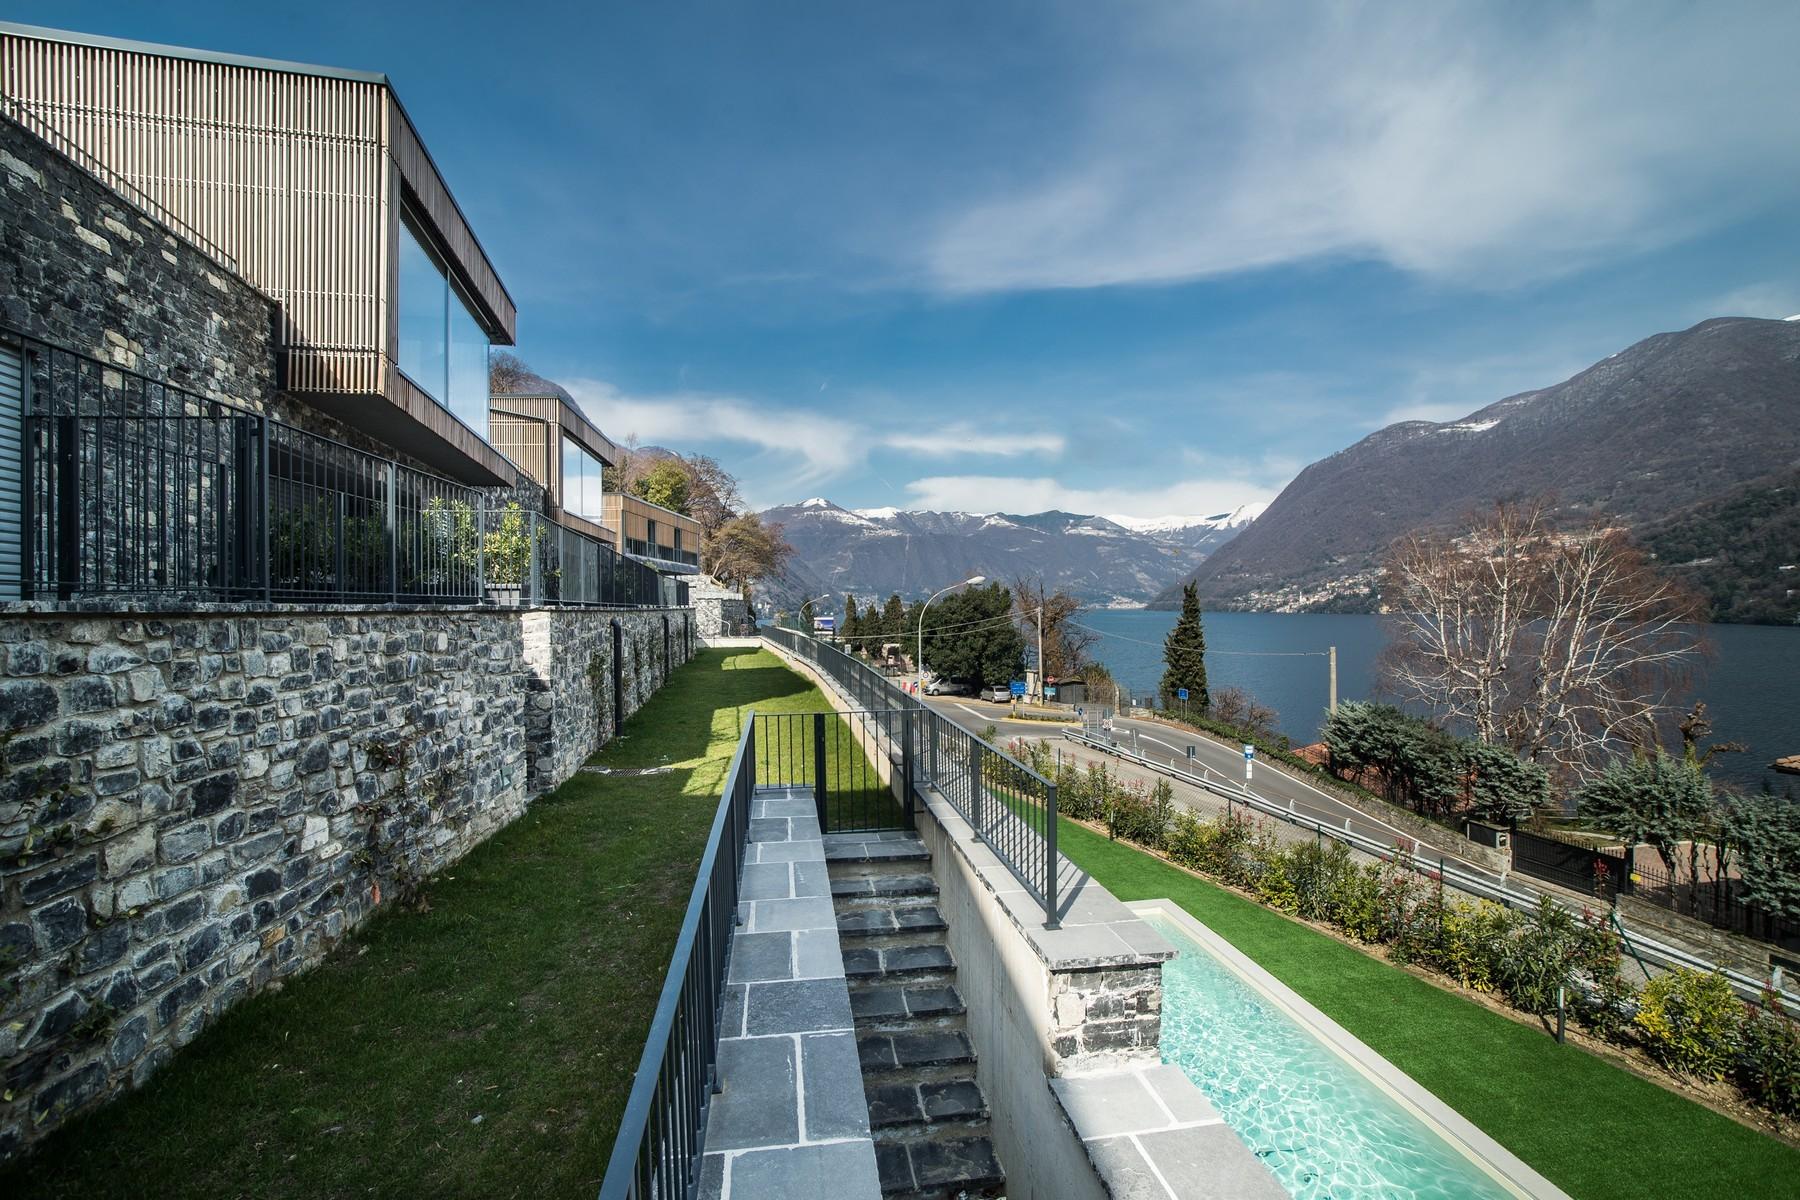 Apartment for Sale at Prestigious newly built apartment Laglio Laglio, Como 22010 Italy